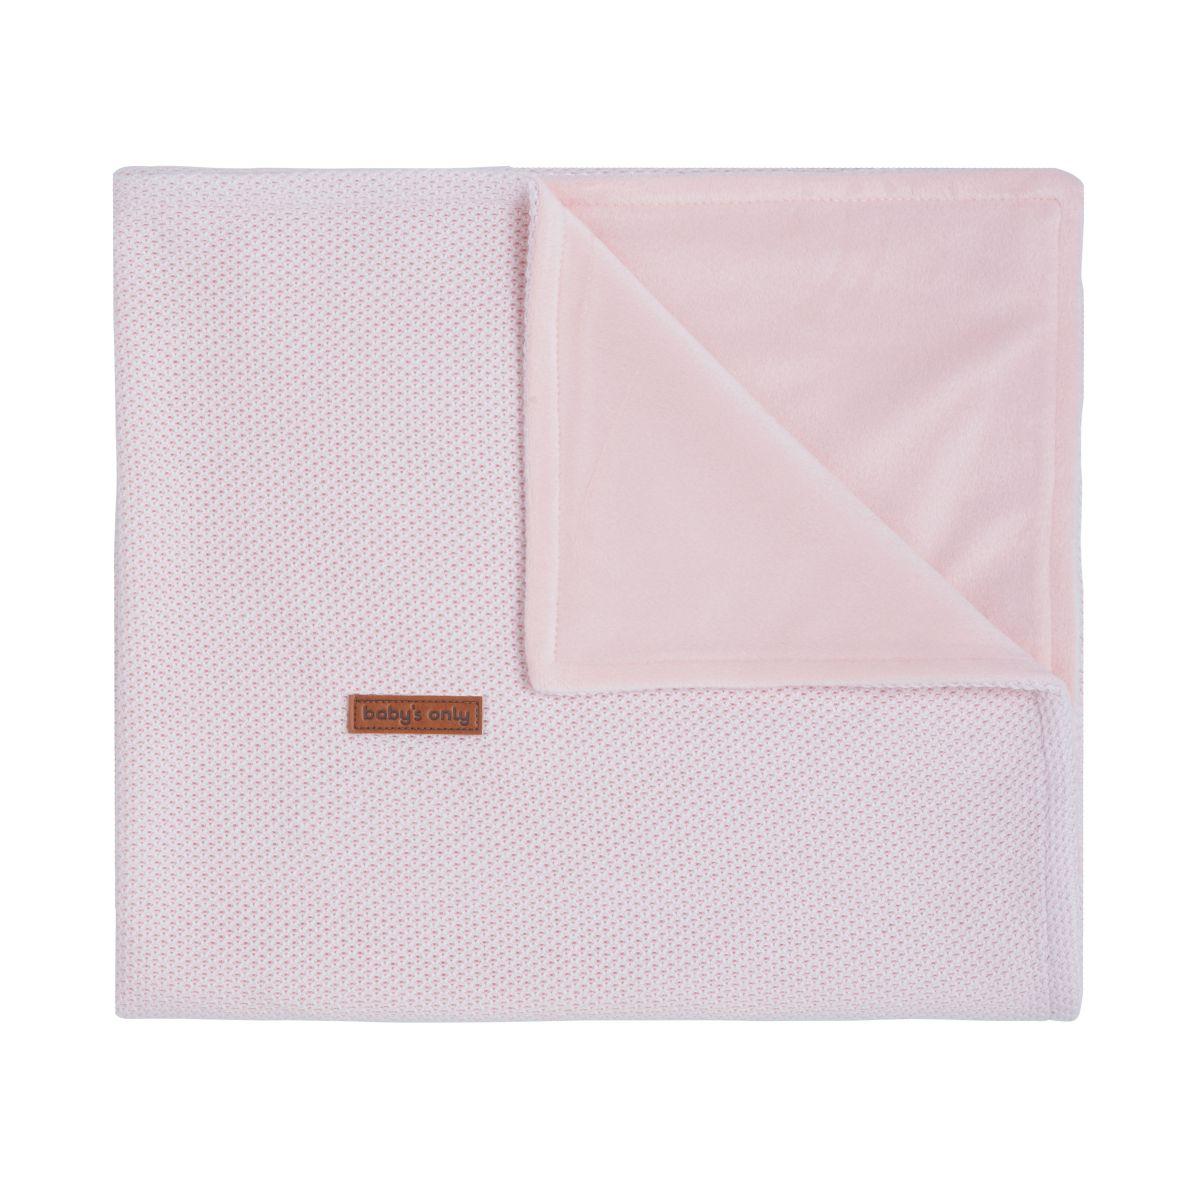 babys only 0201001 wiegdeken soft classic roze